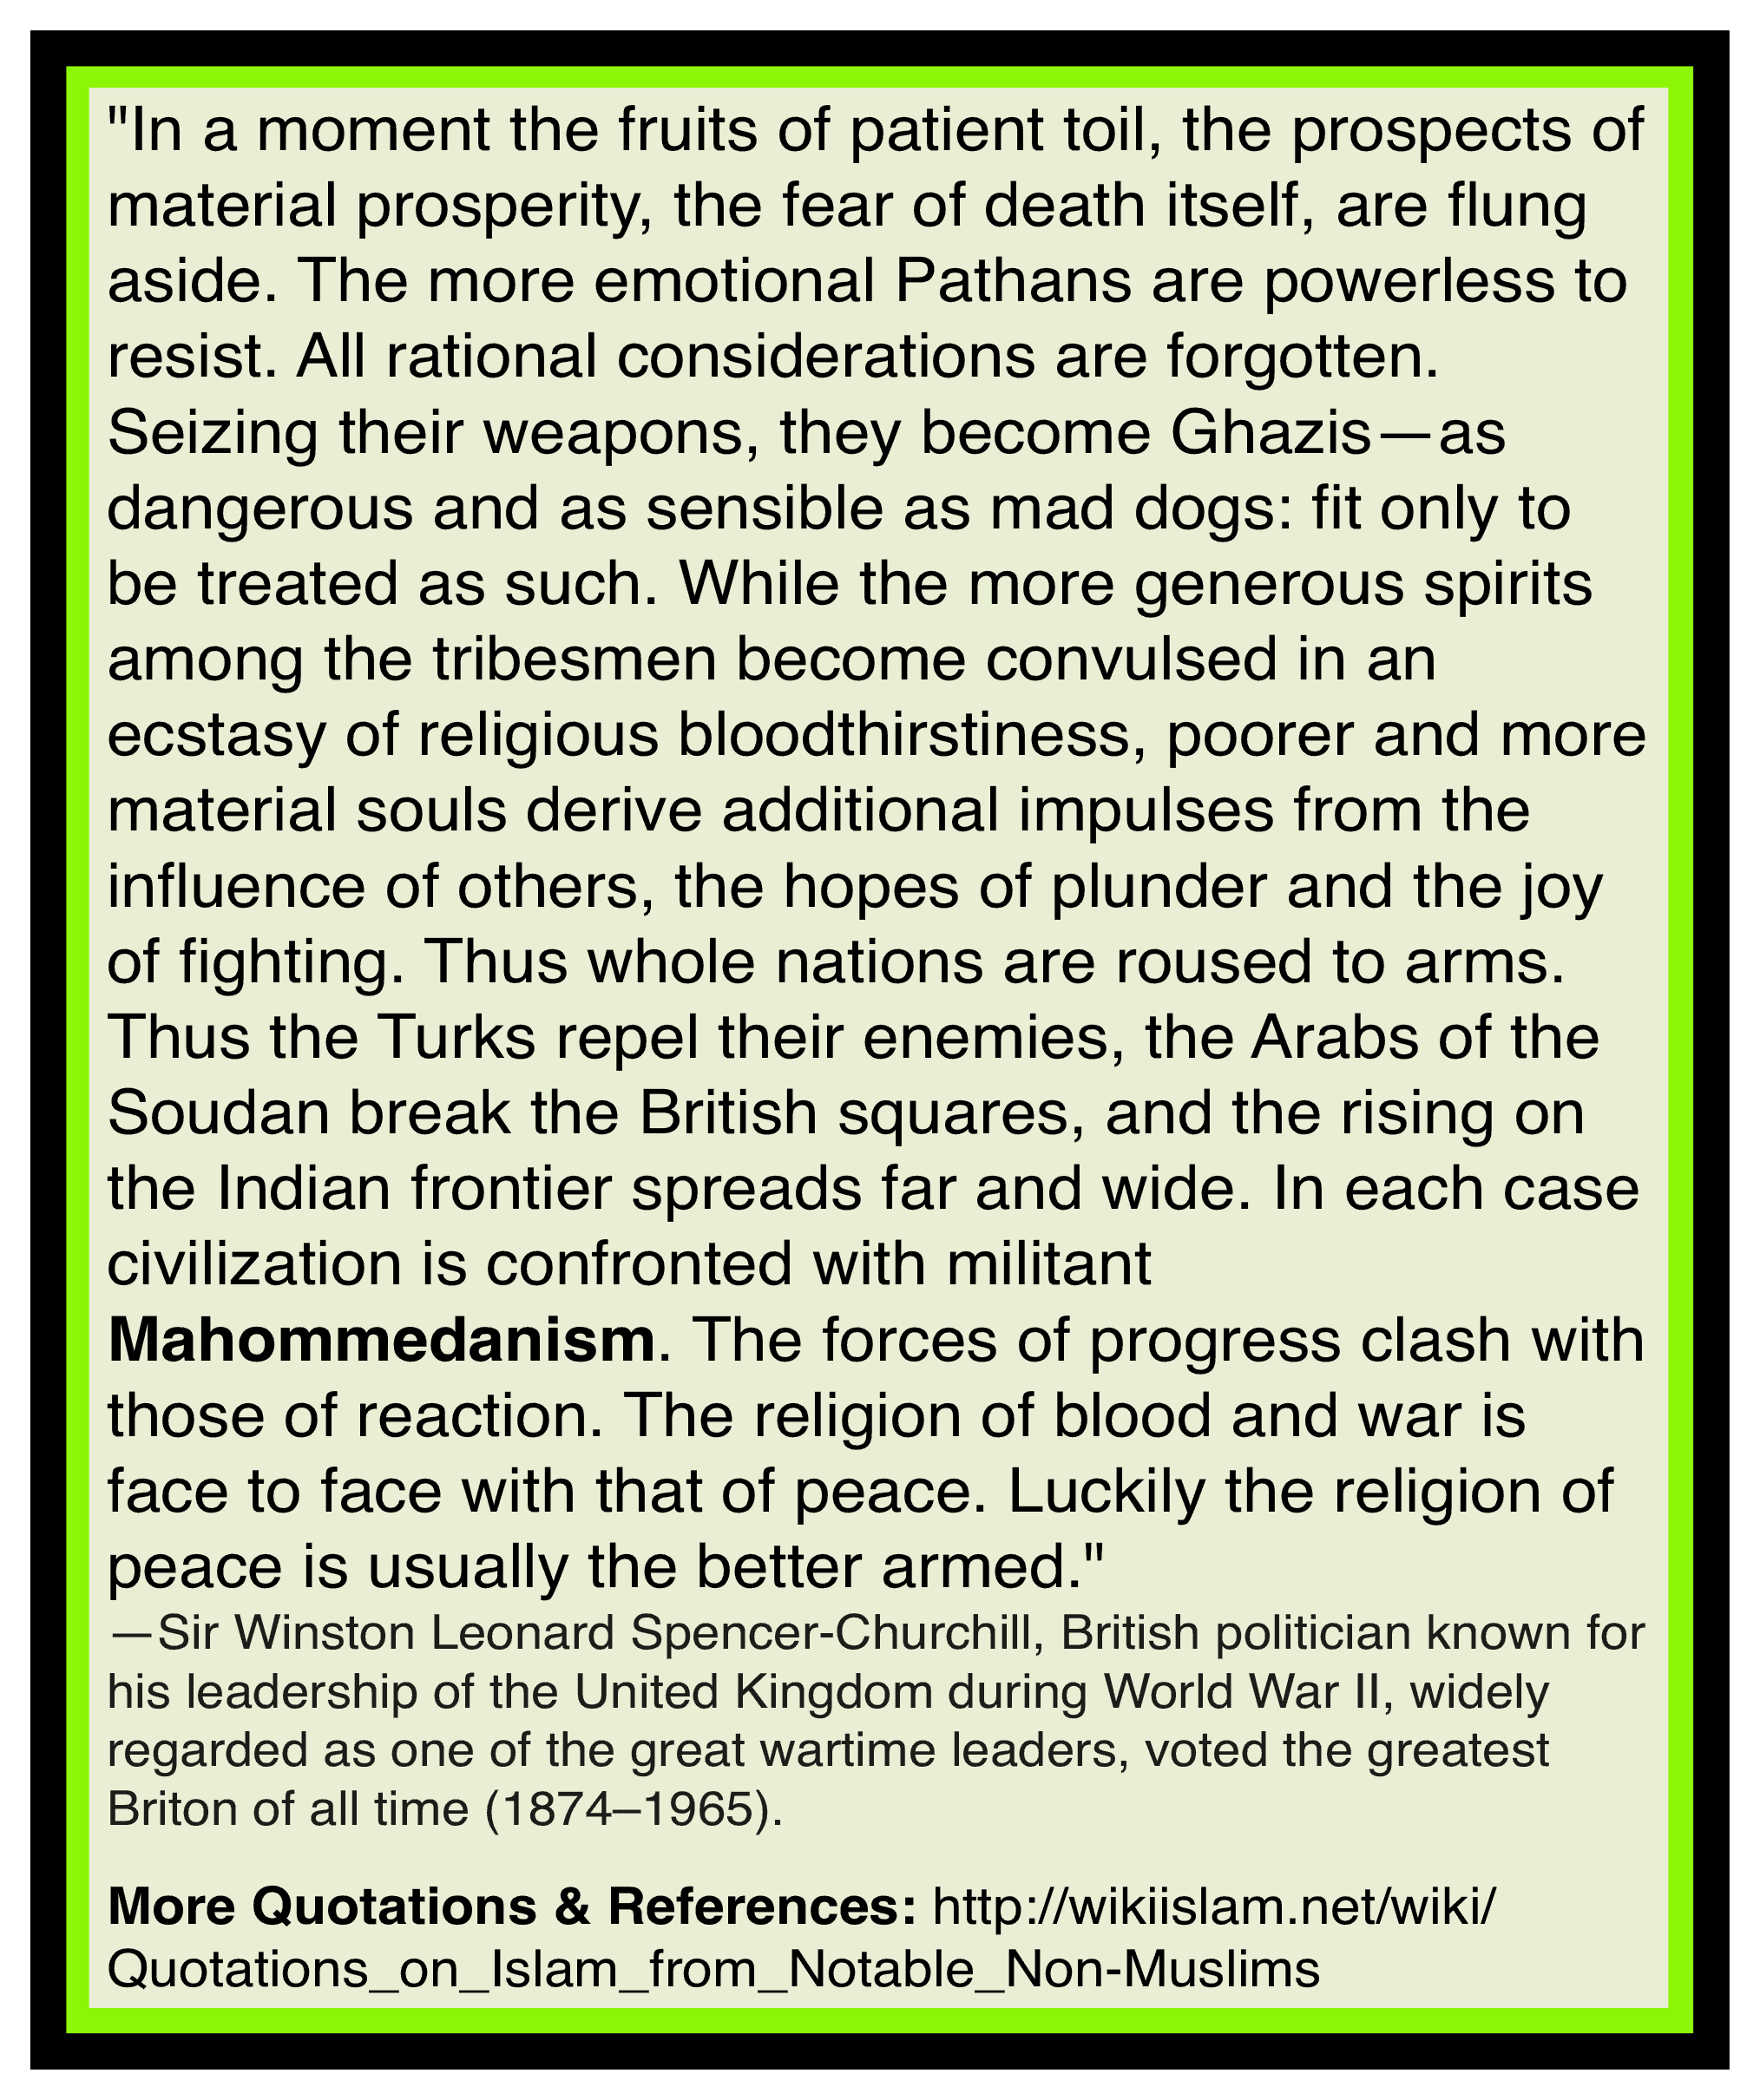 Islam is anti-civilization